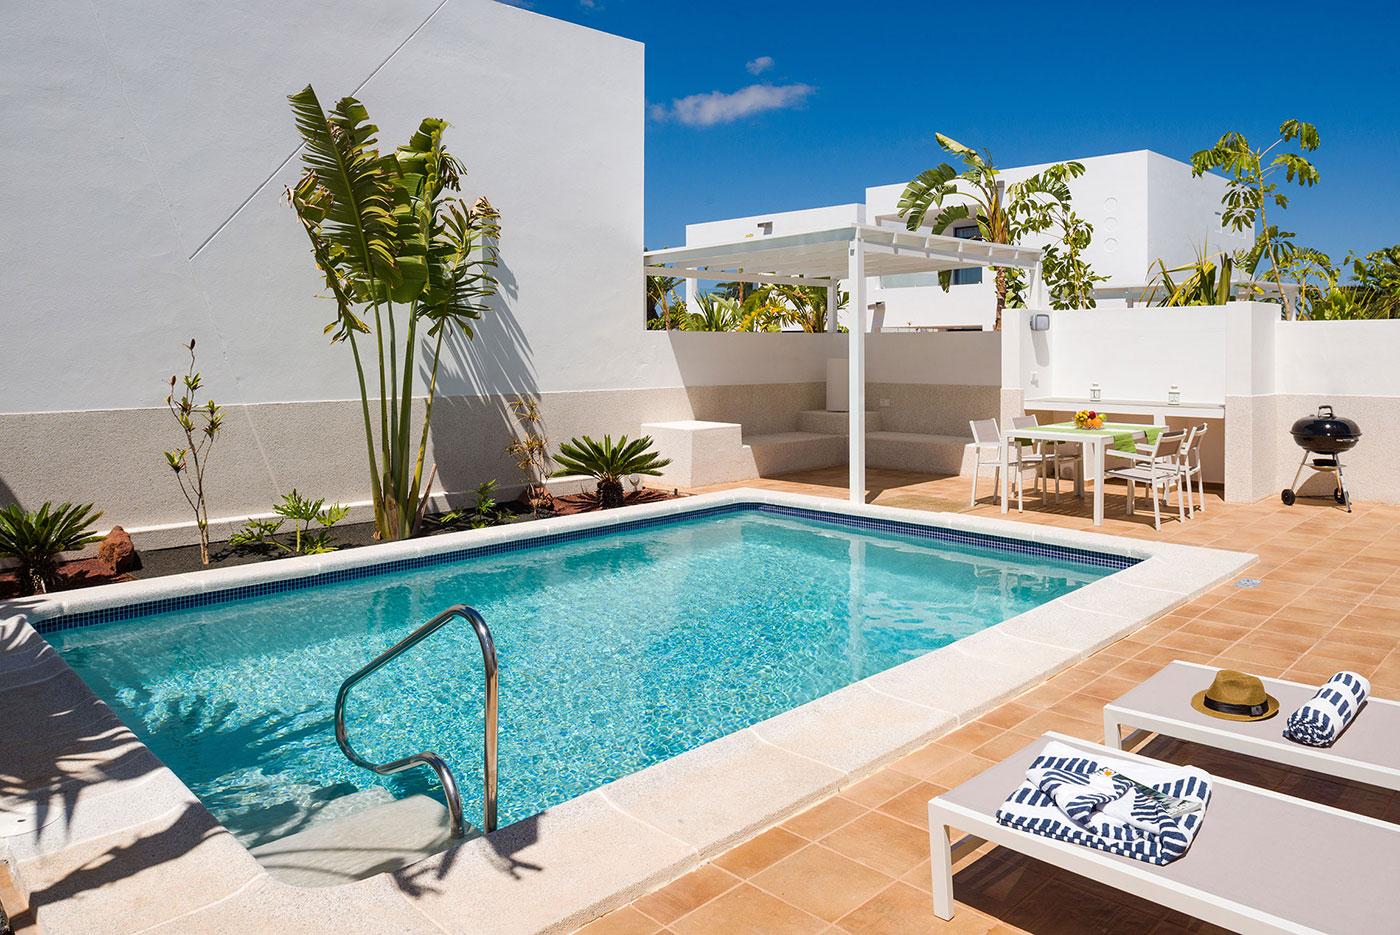 villas-de-la-marina-terrace_5